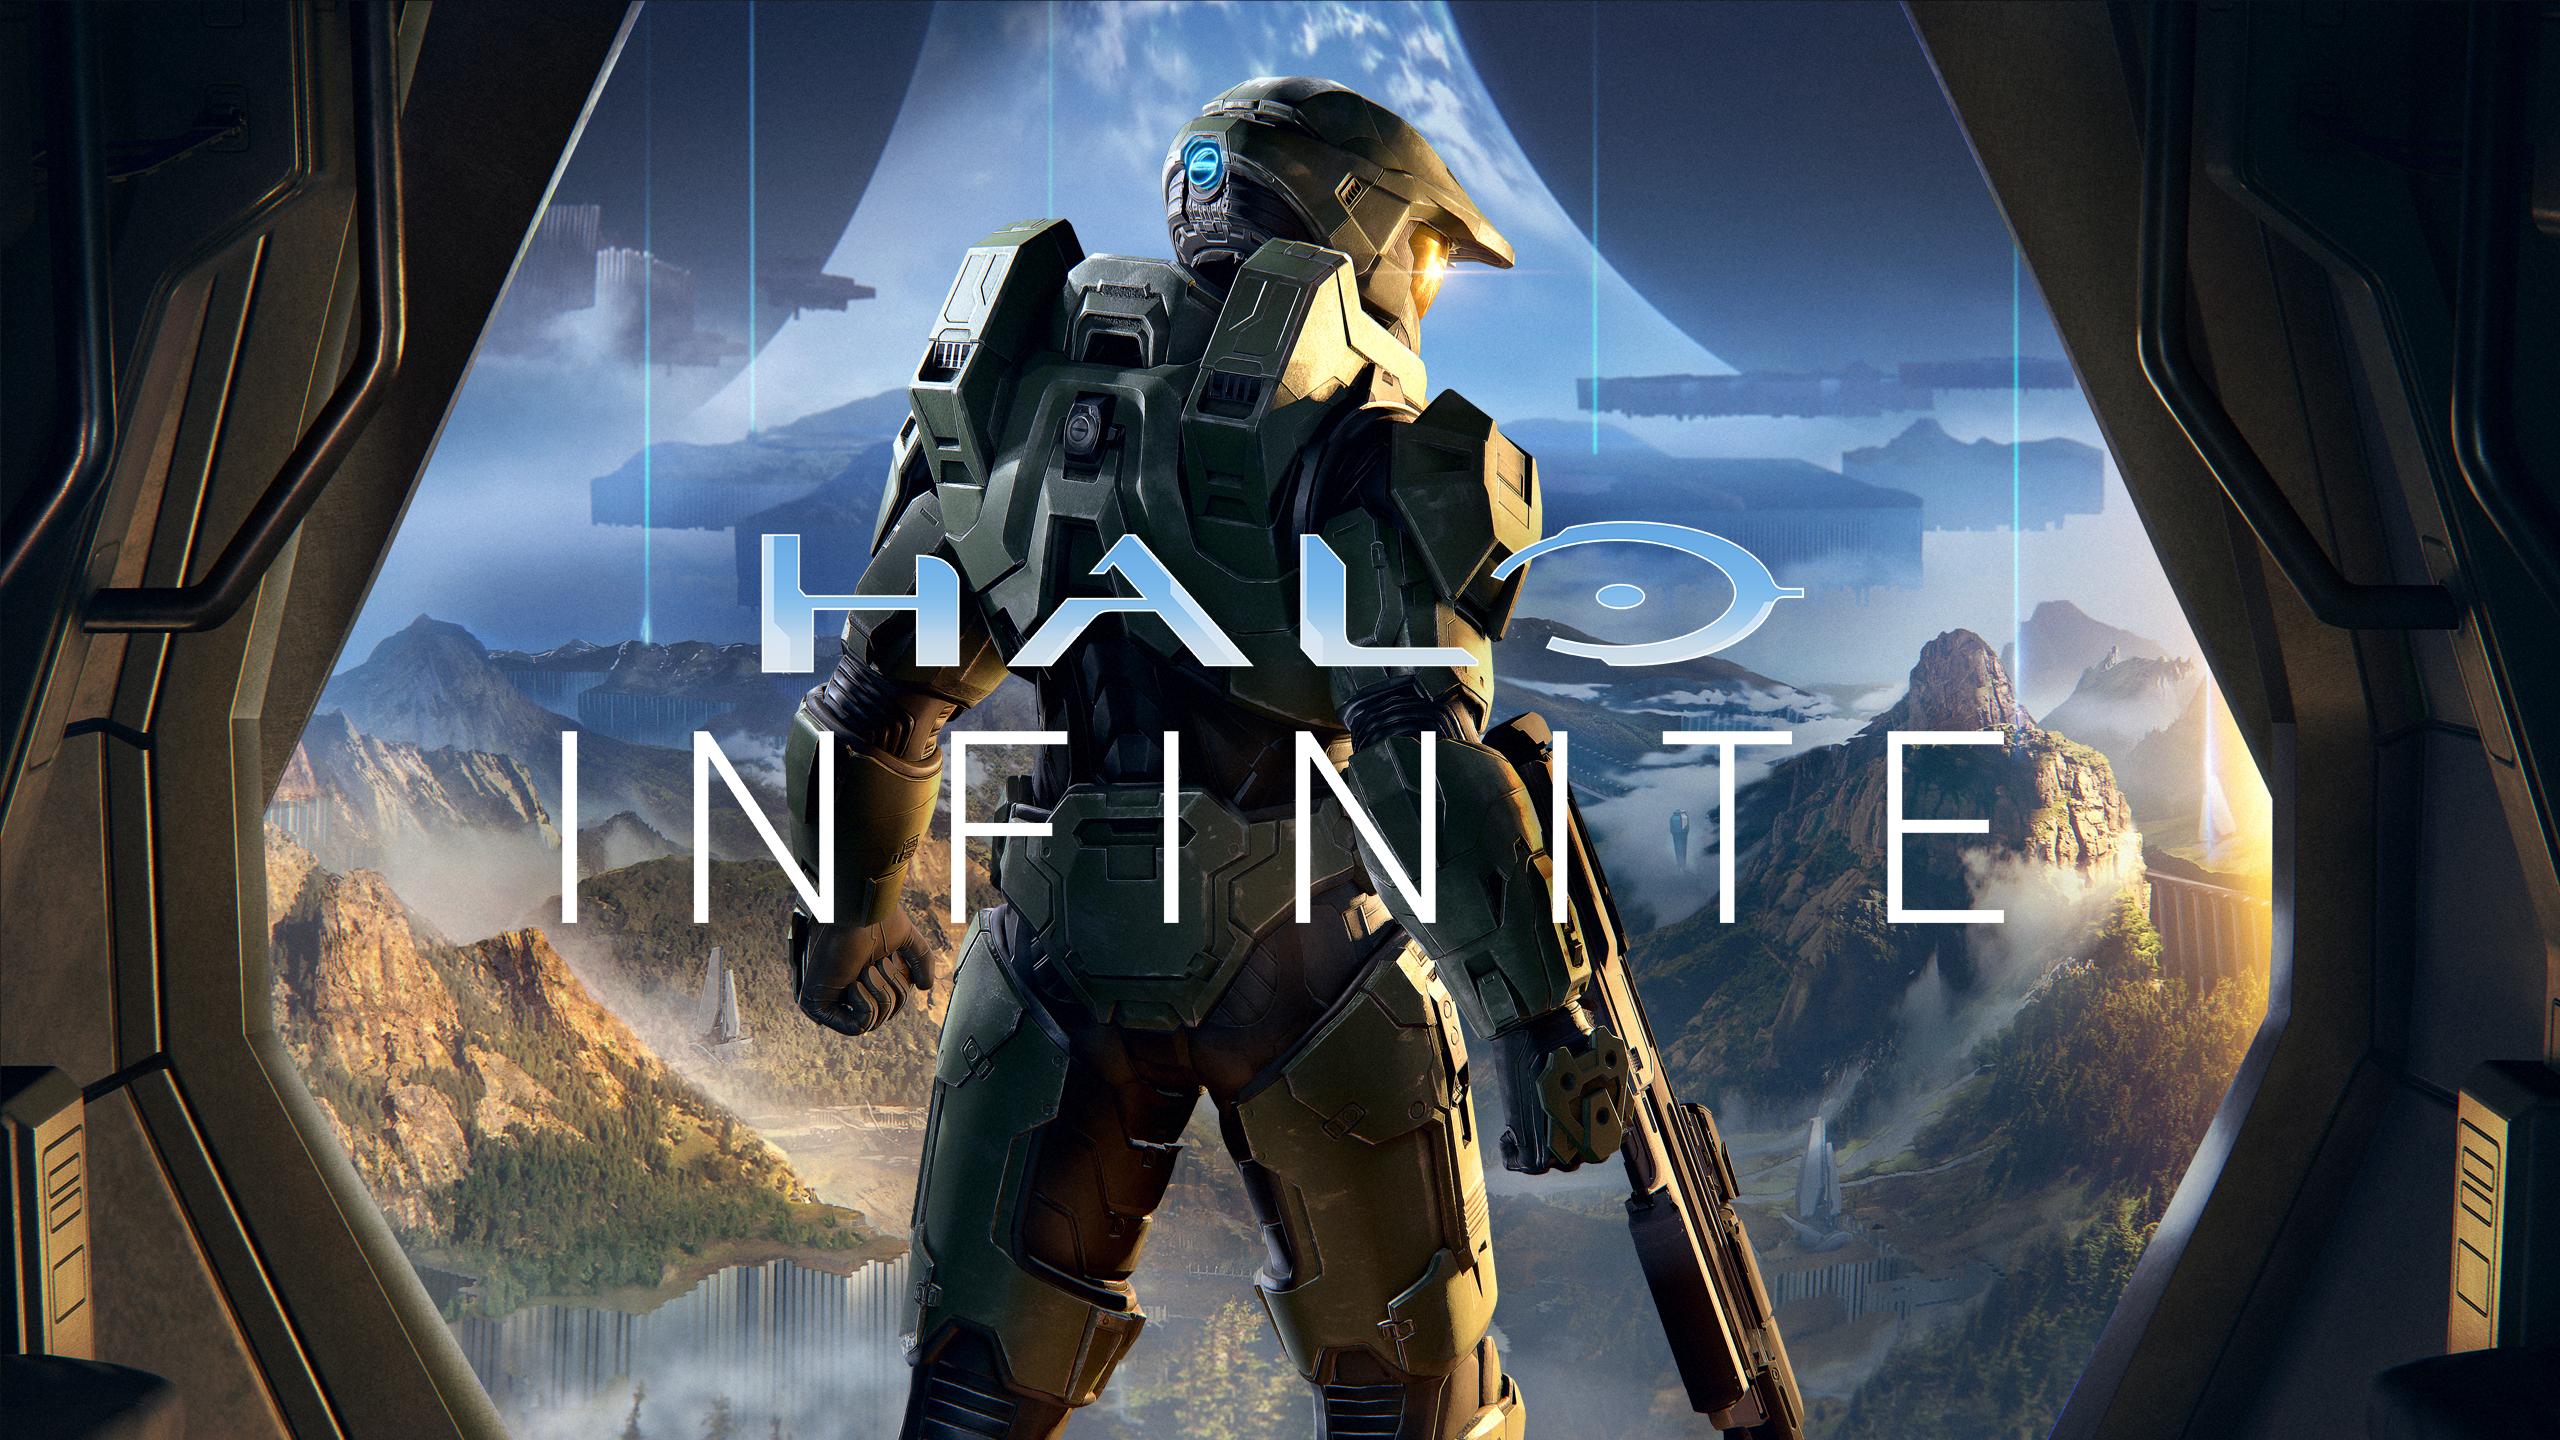 Newest Halo Infinite Wallpaper